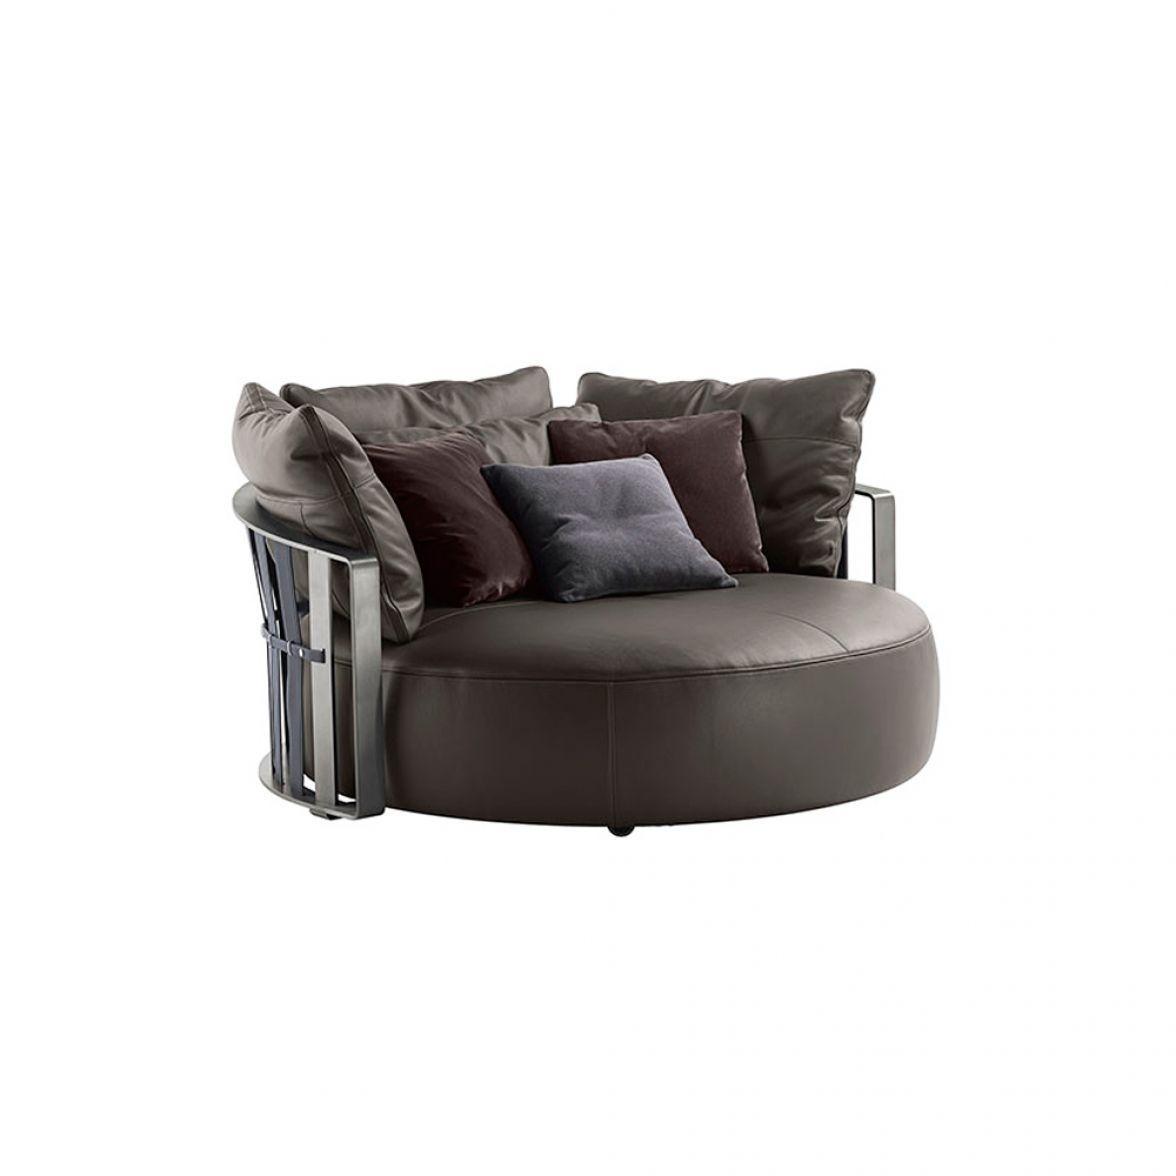 Scarlett armchair фото цена